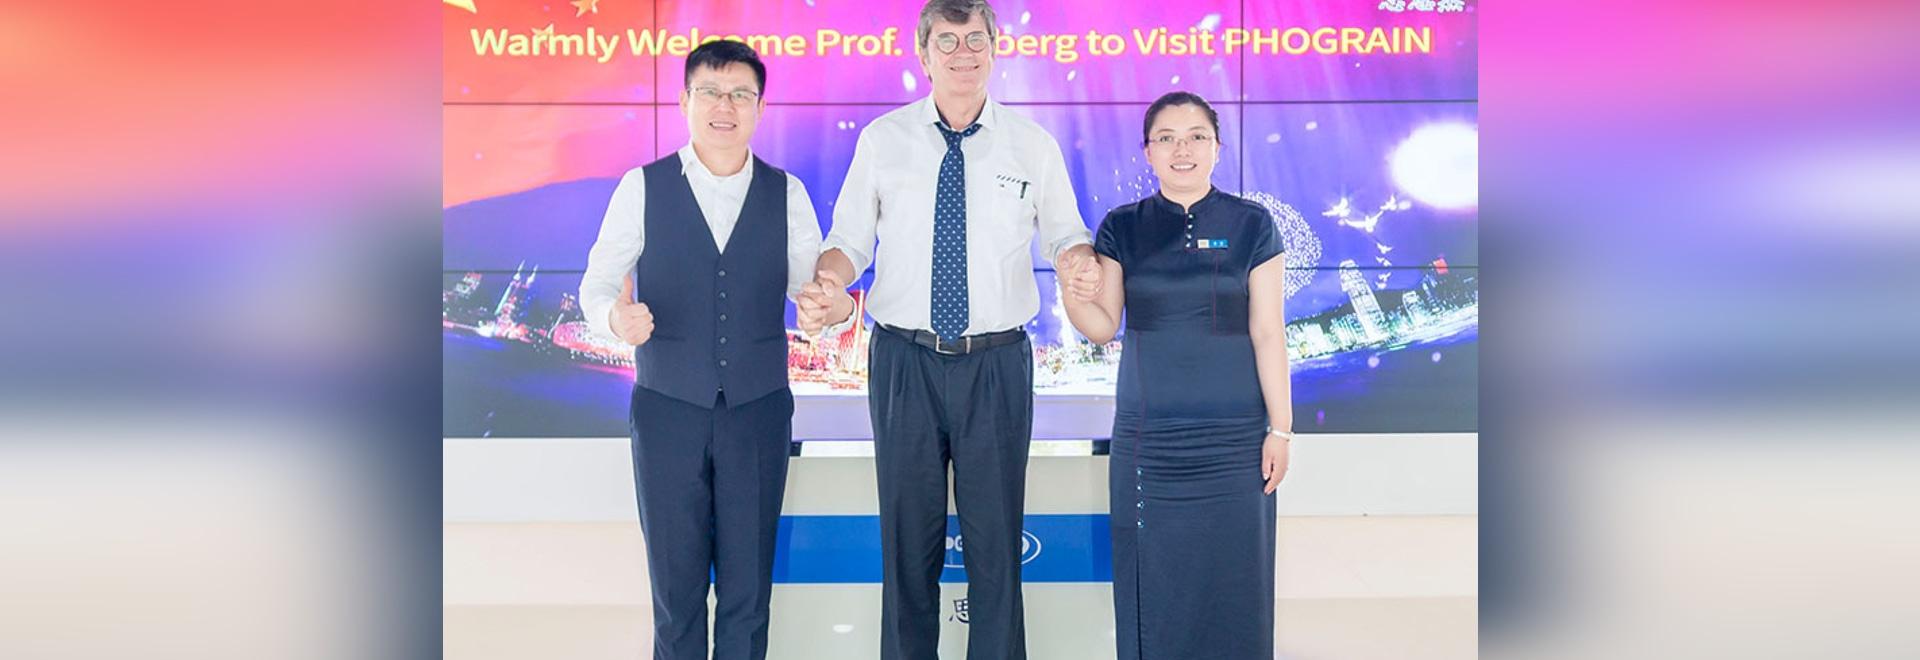 Bienvenido Prof. Dieter Bimberg Visitando PHOGRAIN